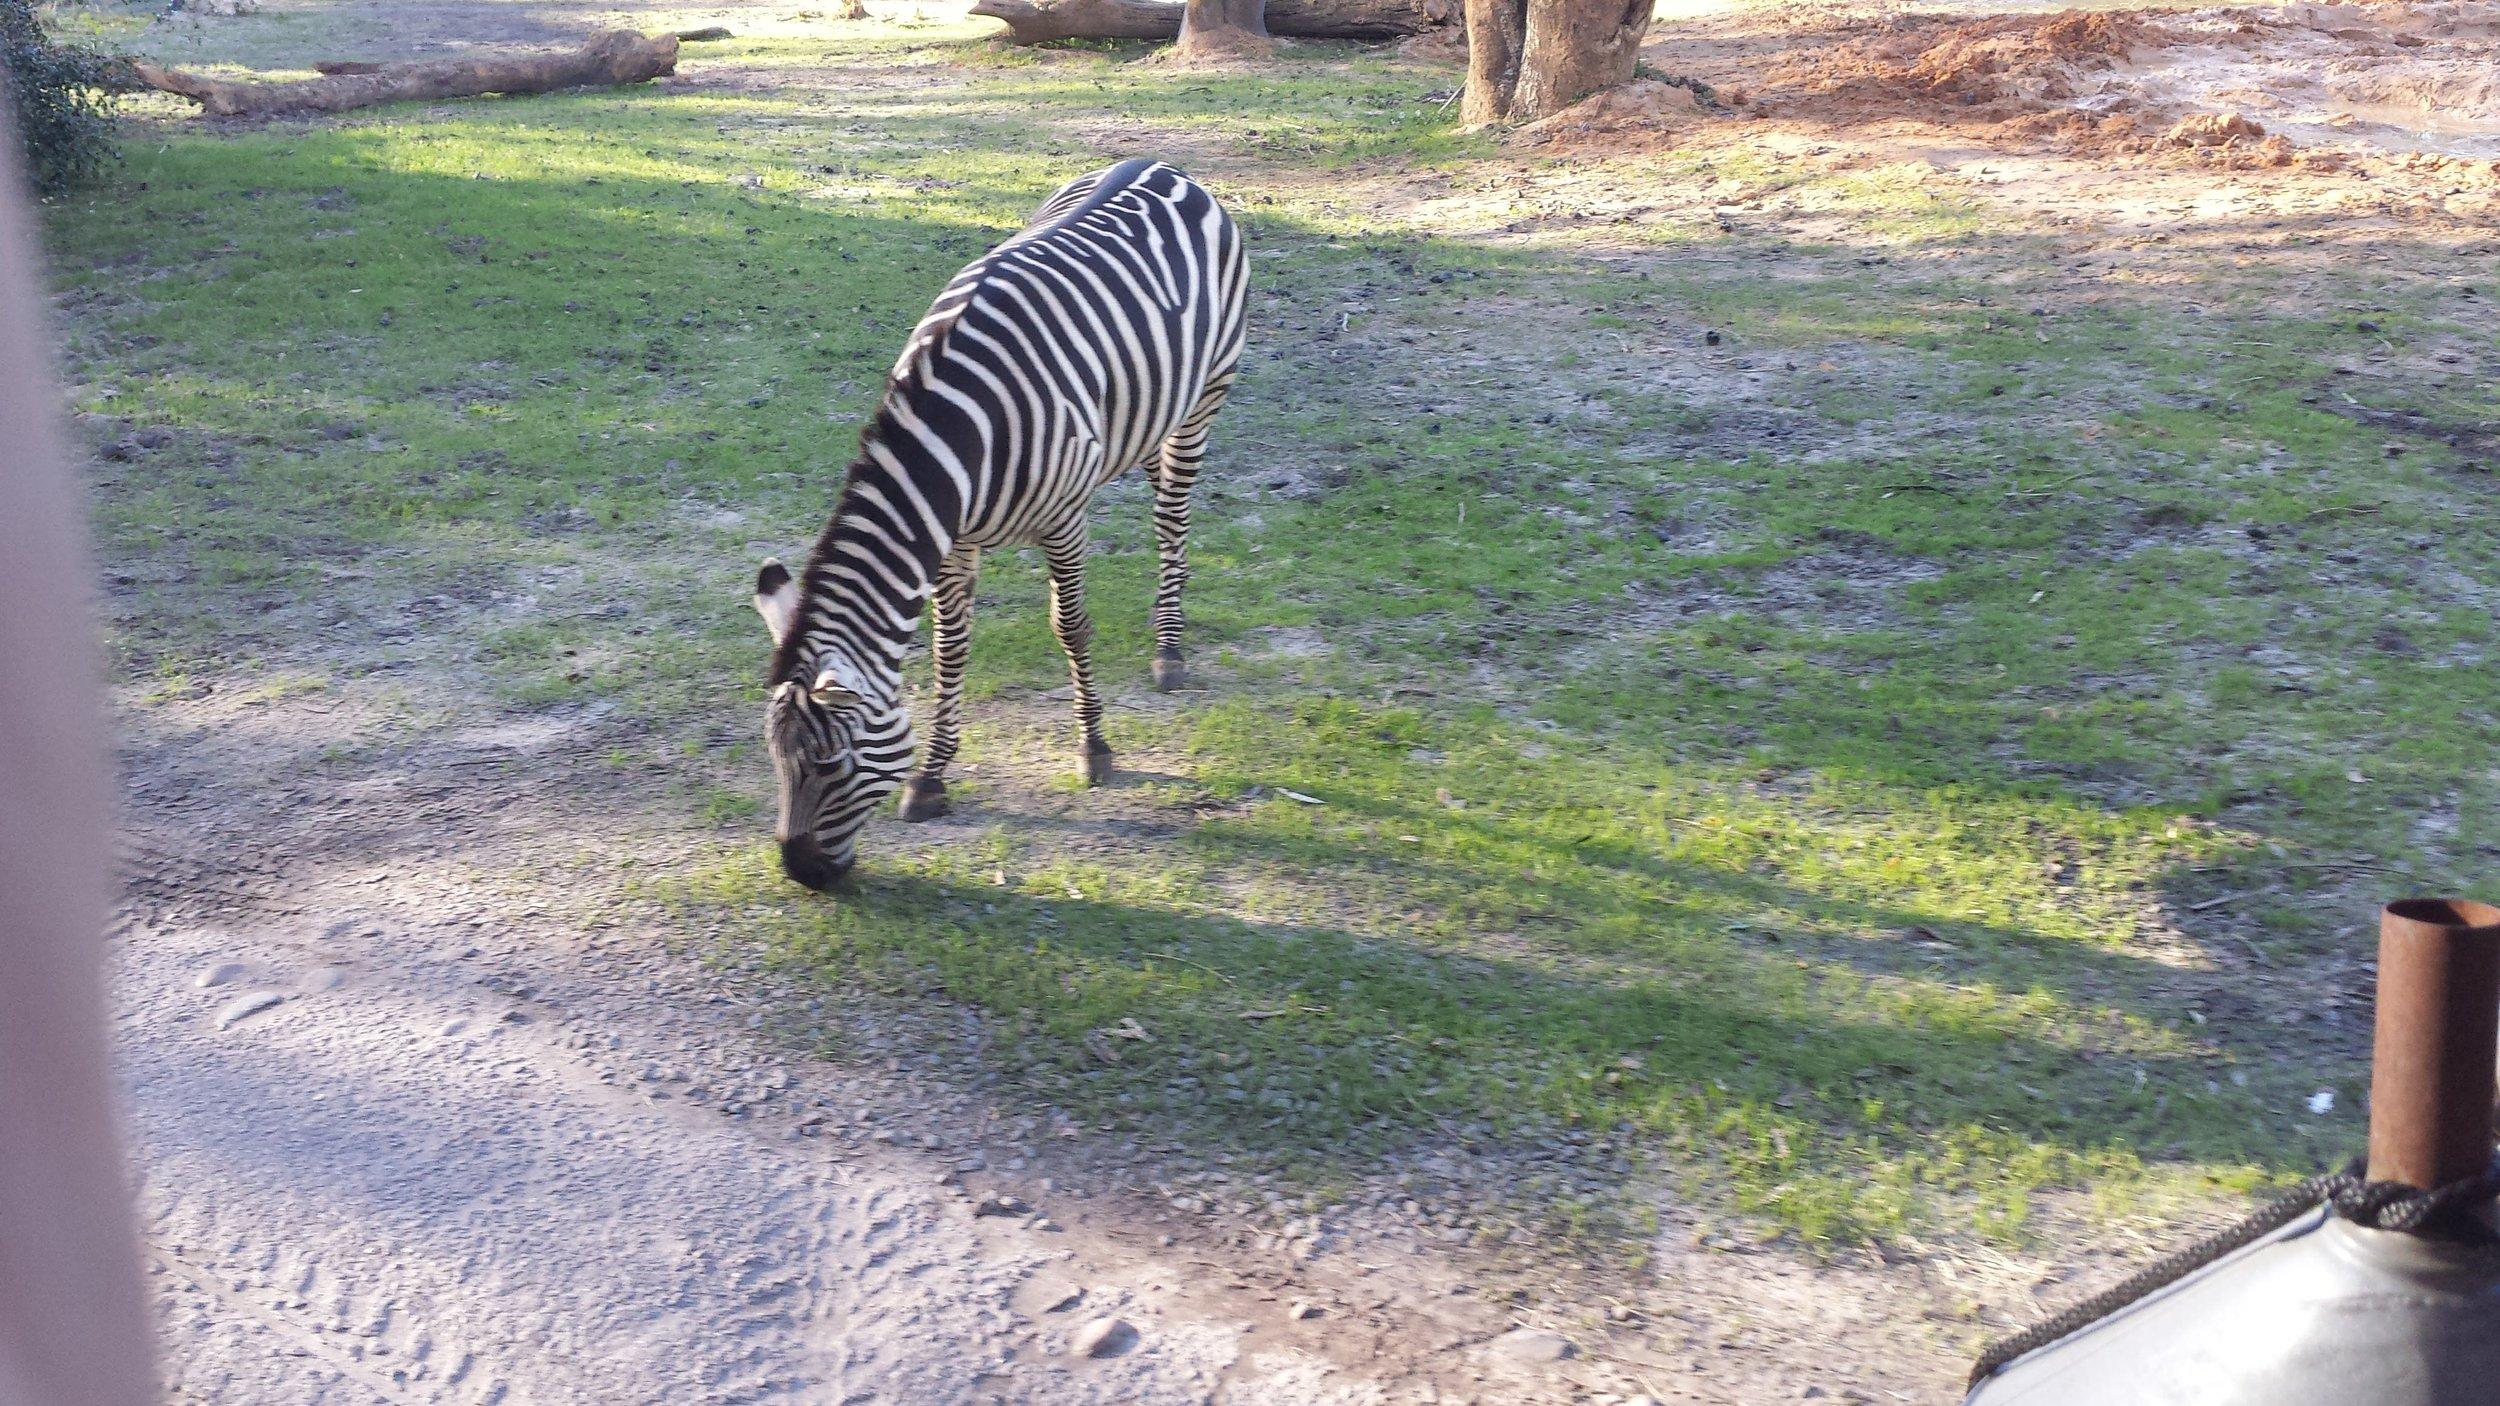 More safari.